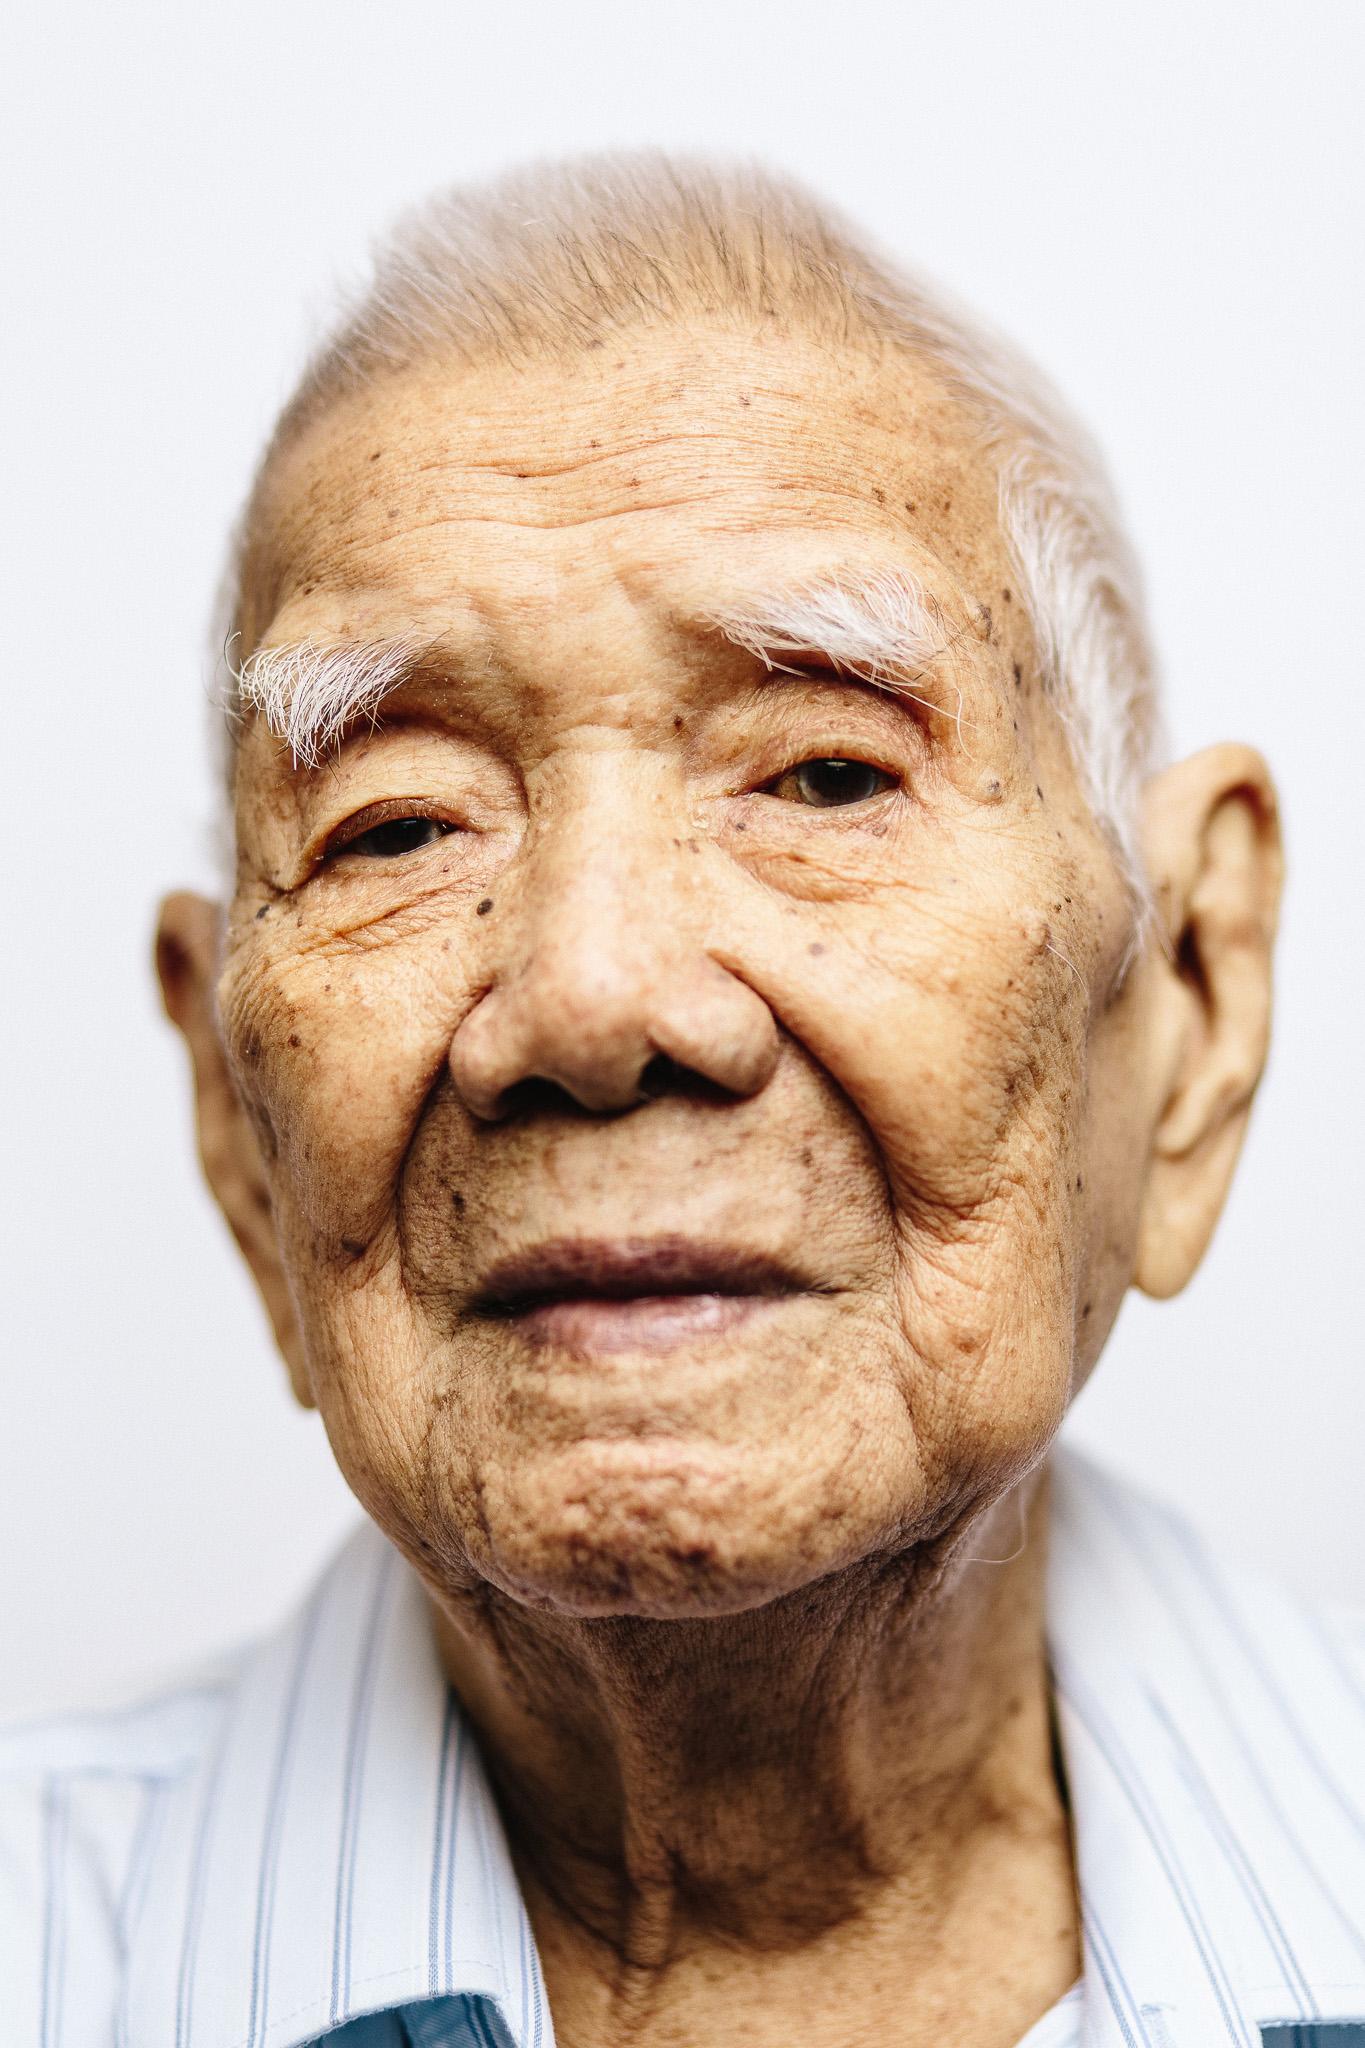 zainal-zainal-studio-centenarians-care-duke-nus-singapore-photographer-07.jpg